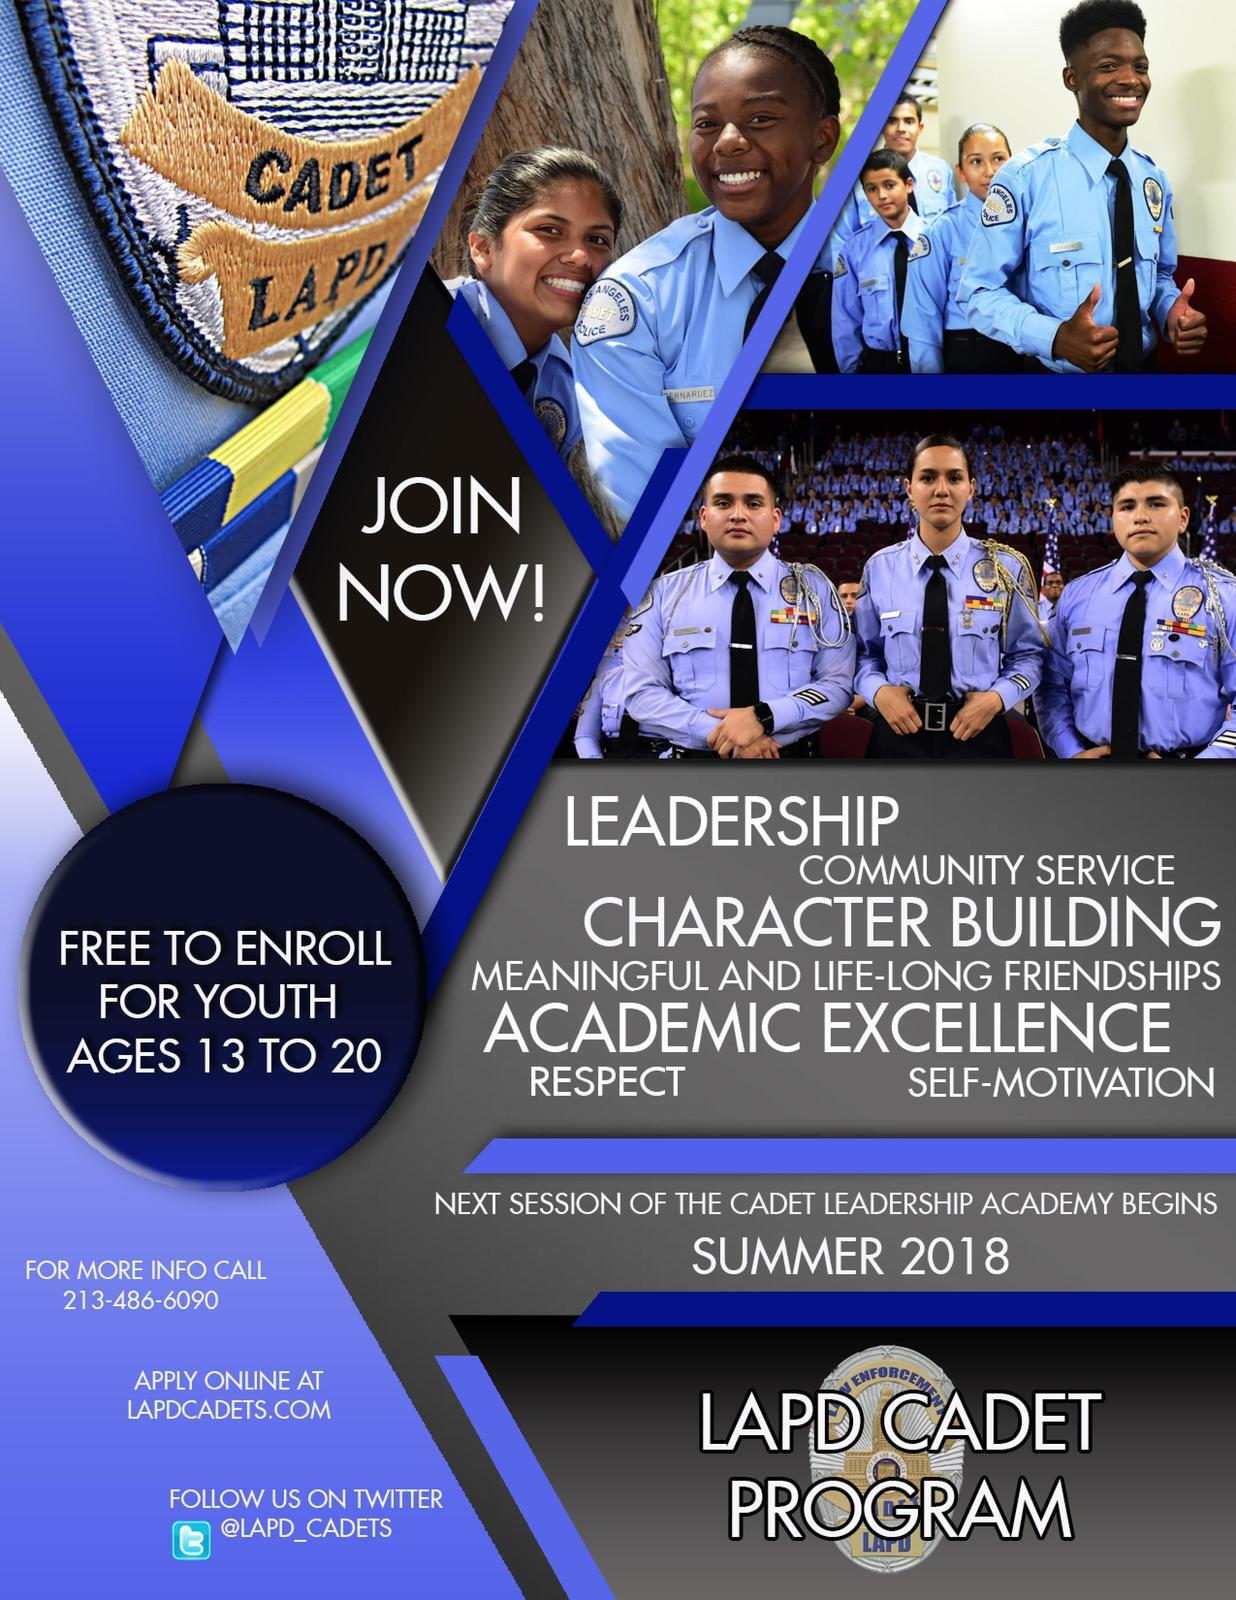 LAPD CADET PROGRAM (Los Angeles Police Department) &mdash